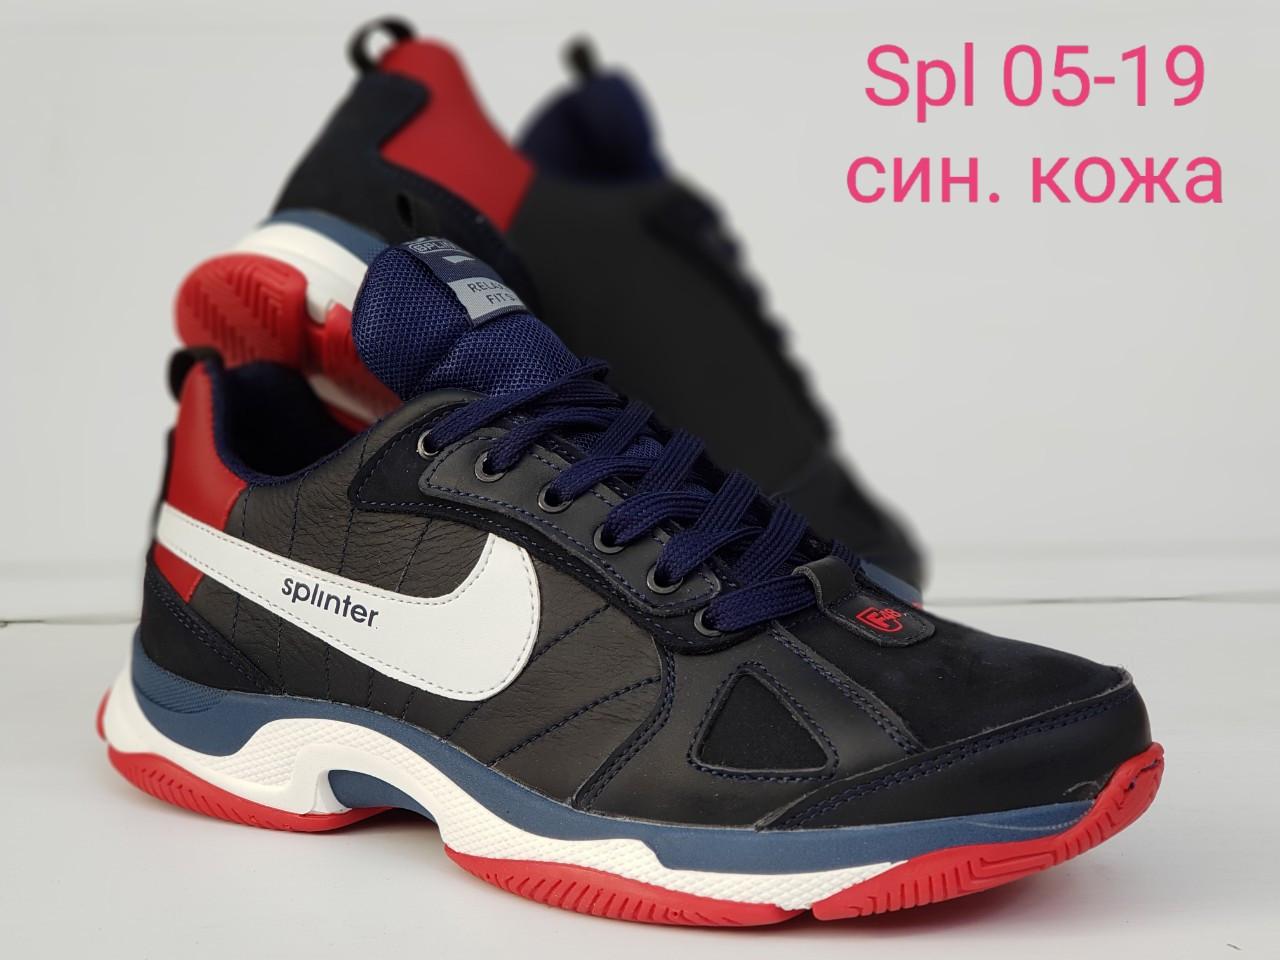 Кроссовки в стиле Splinter 05-19 синие